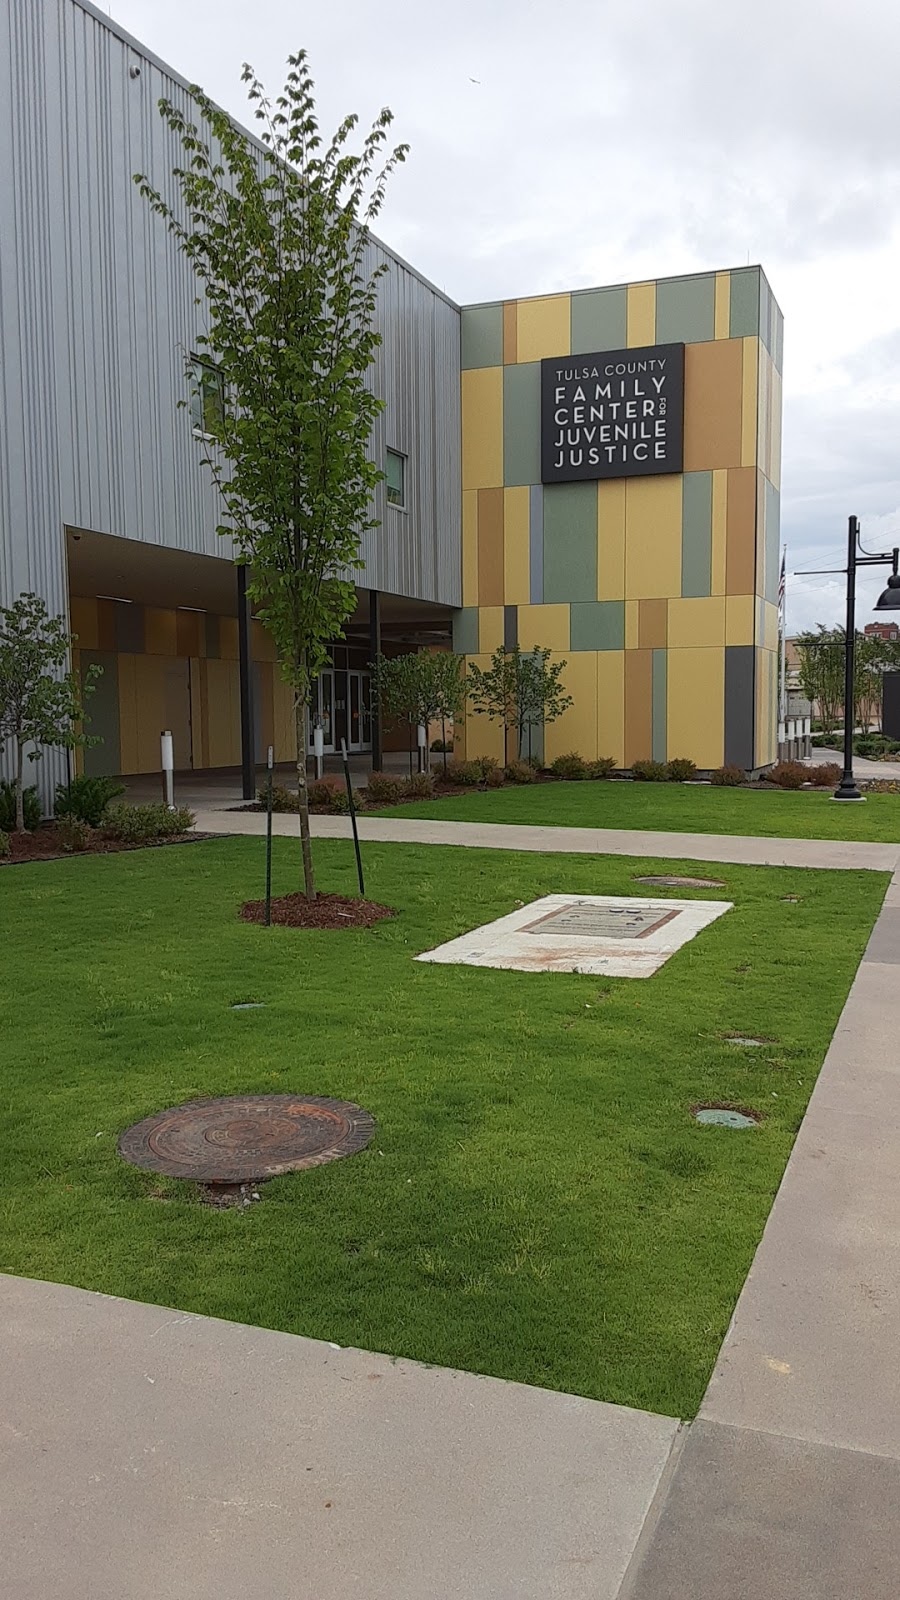 Tulsa County Juvenile Center - local government office  | Photo 1 of 1 | Address: 500 W Archer St, Tulsa, OK 74103, USA | Phone: (918) 591-6015